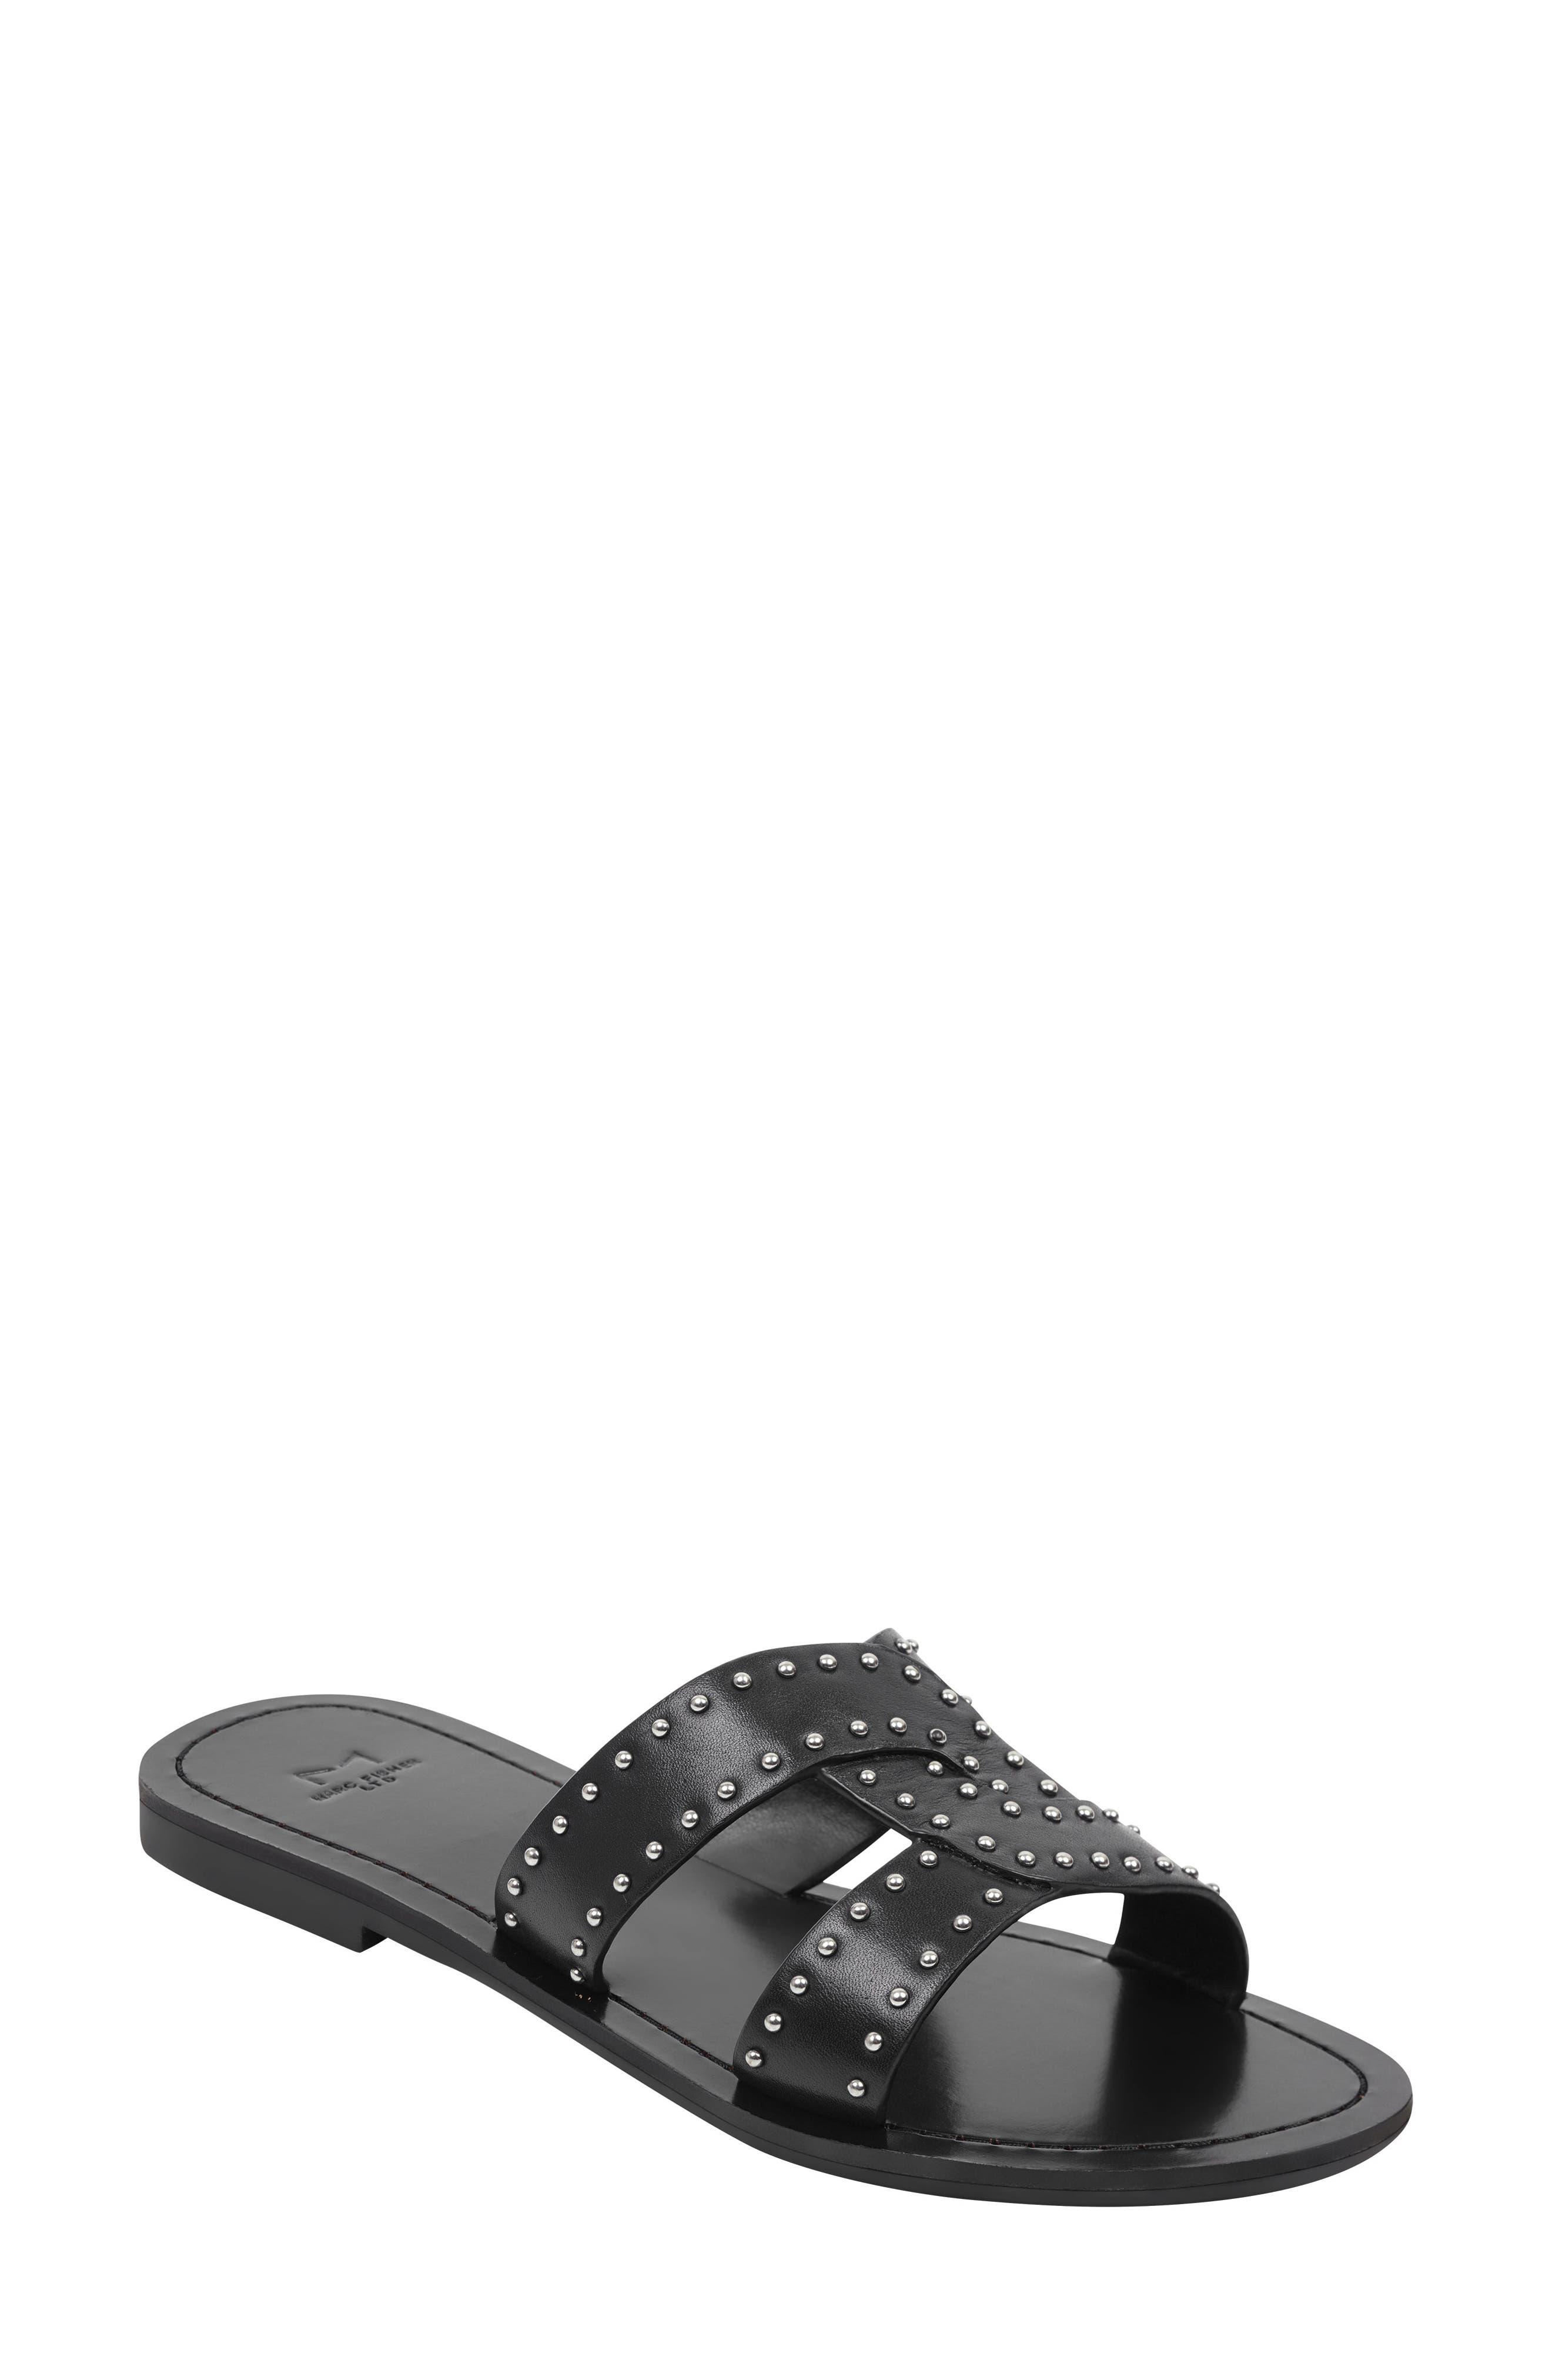 Marc Fisher Ltd Ramie Slide Sandal, Black